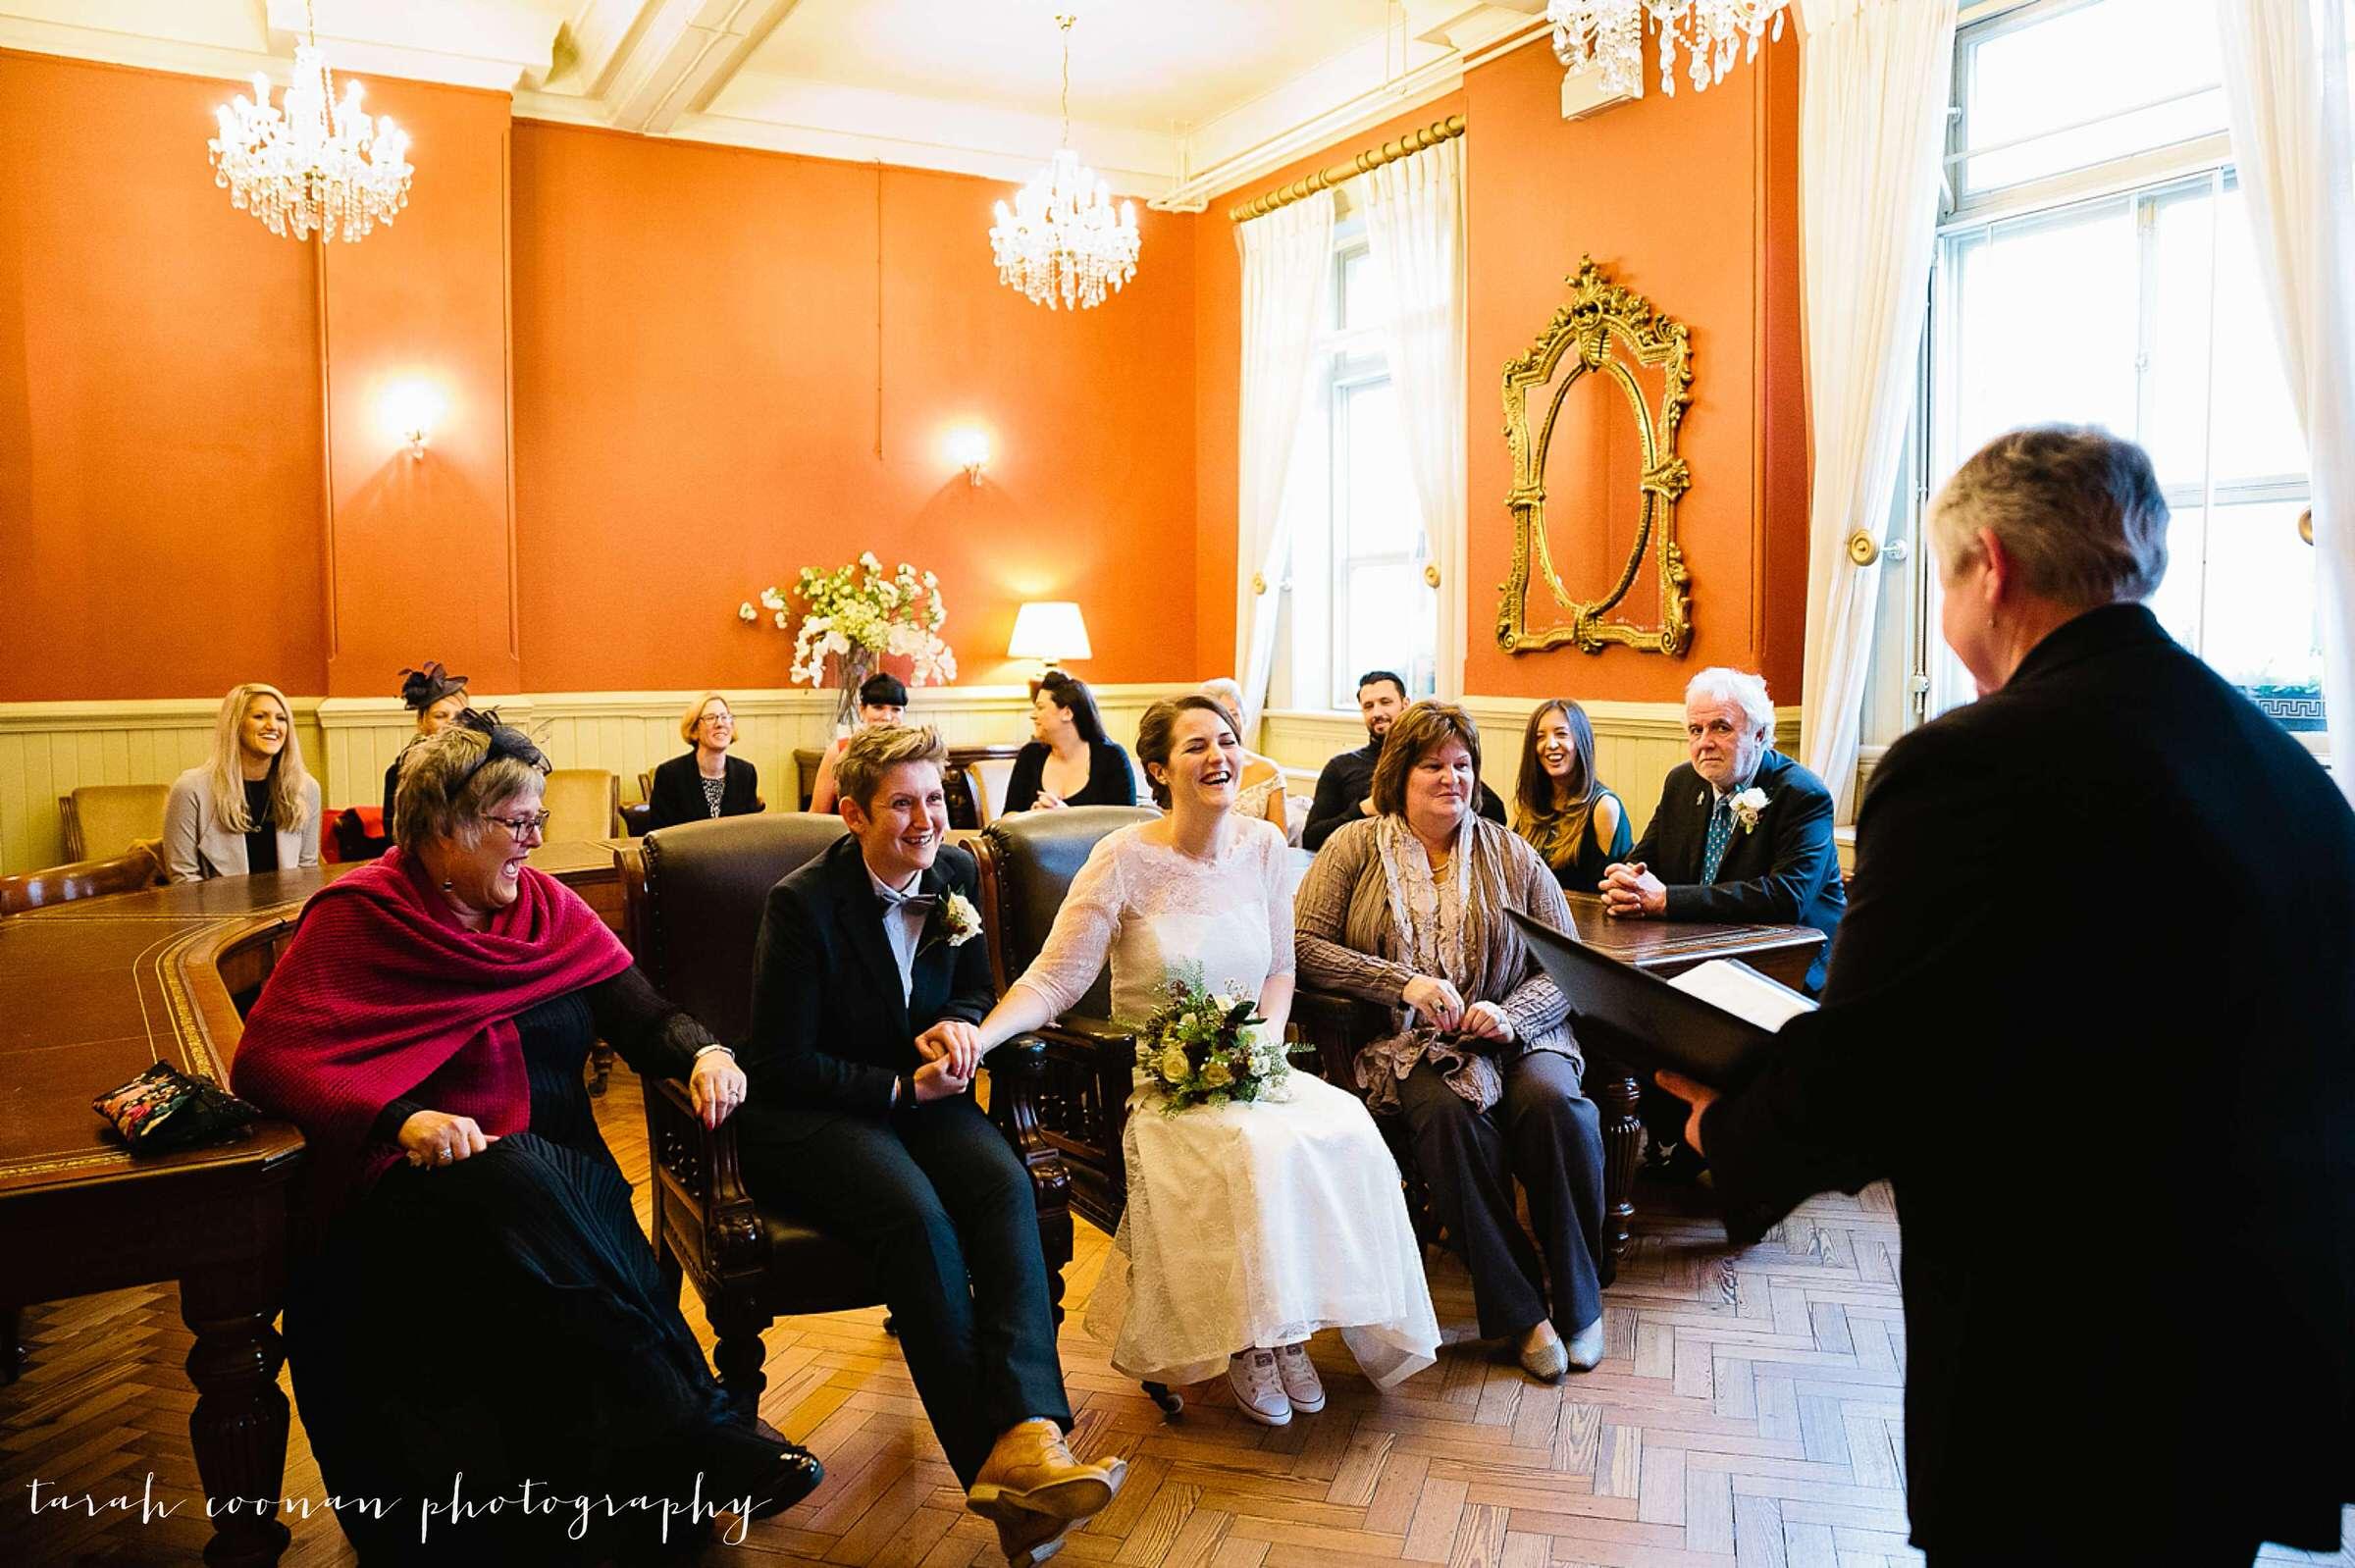 Brighton town hall wedding